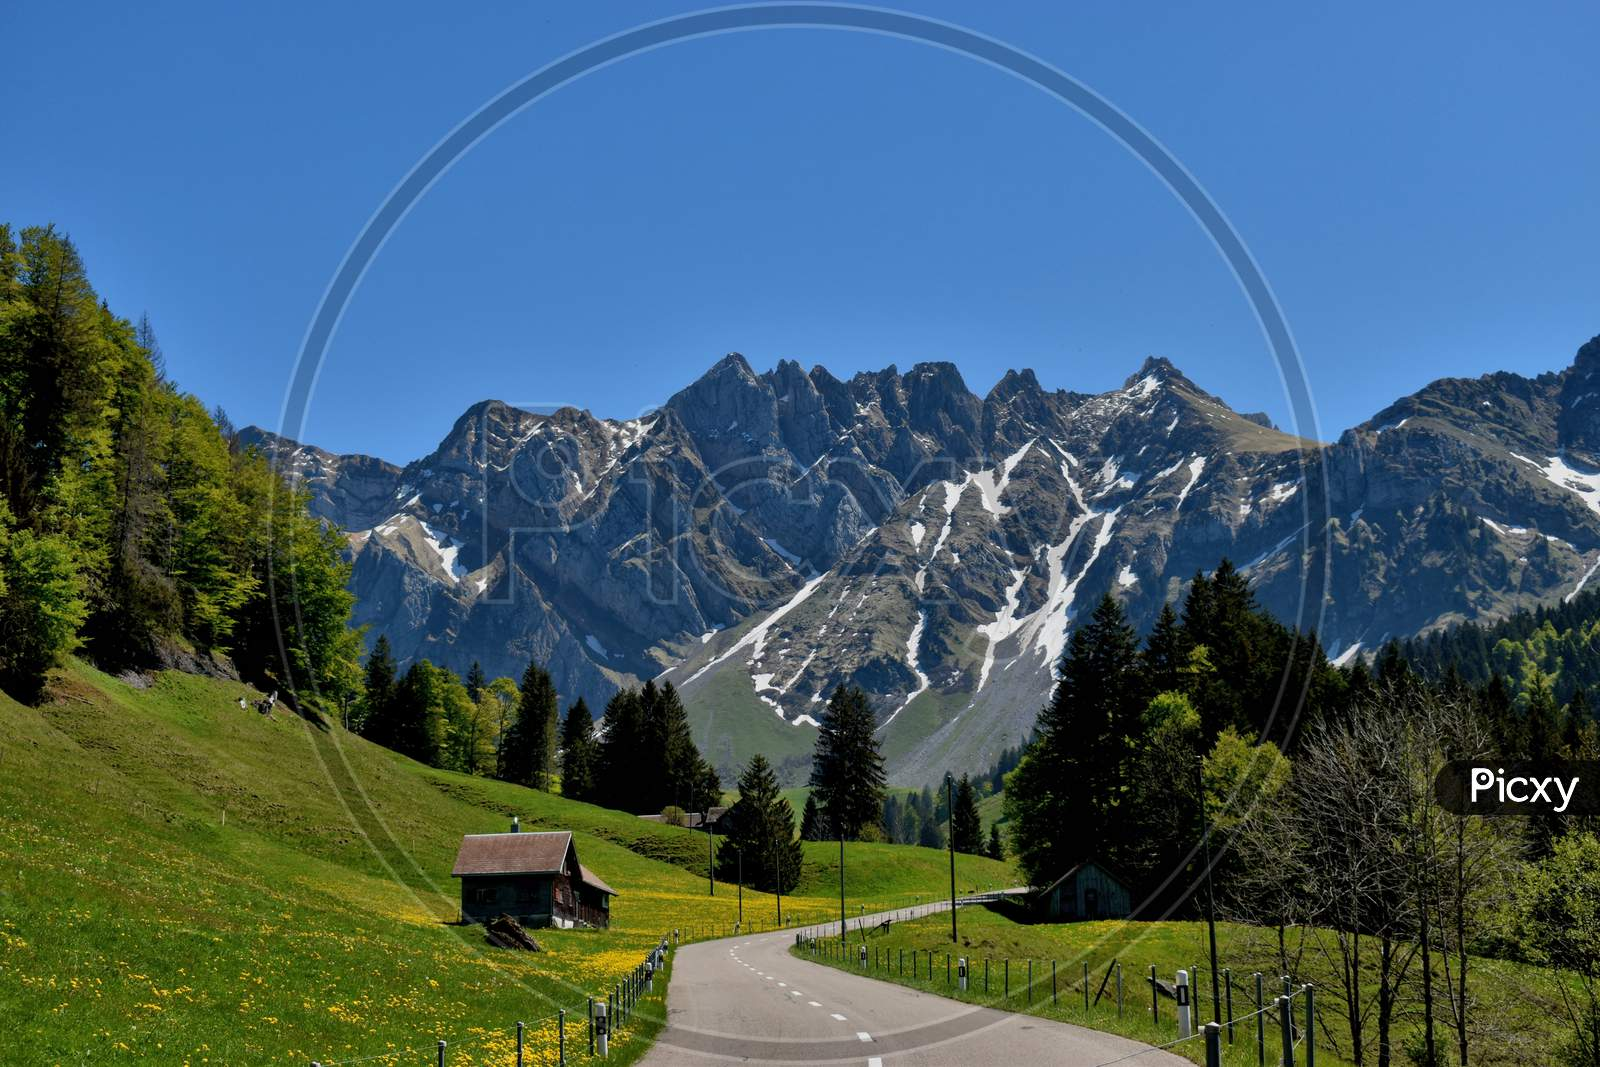 Panorama of the Alpstein mountains in Switzerland 7.5.2020